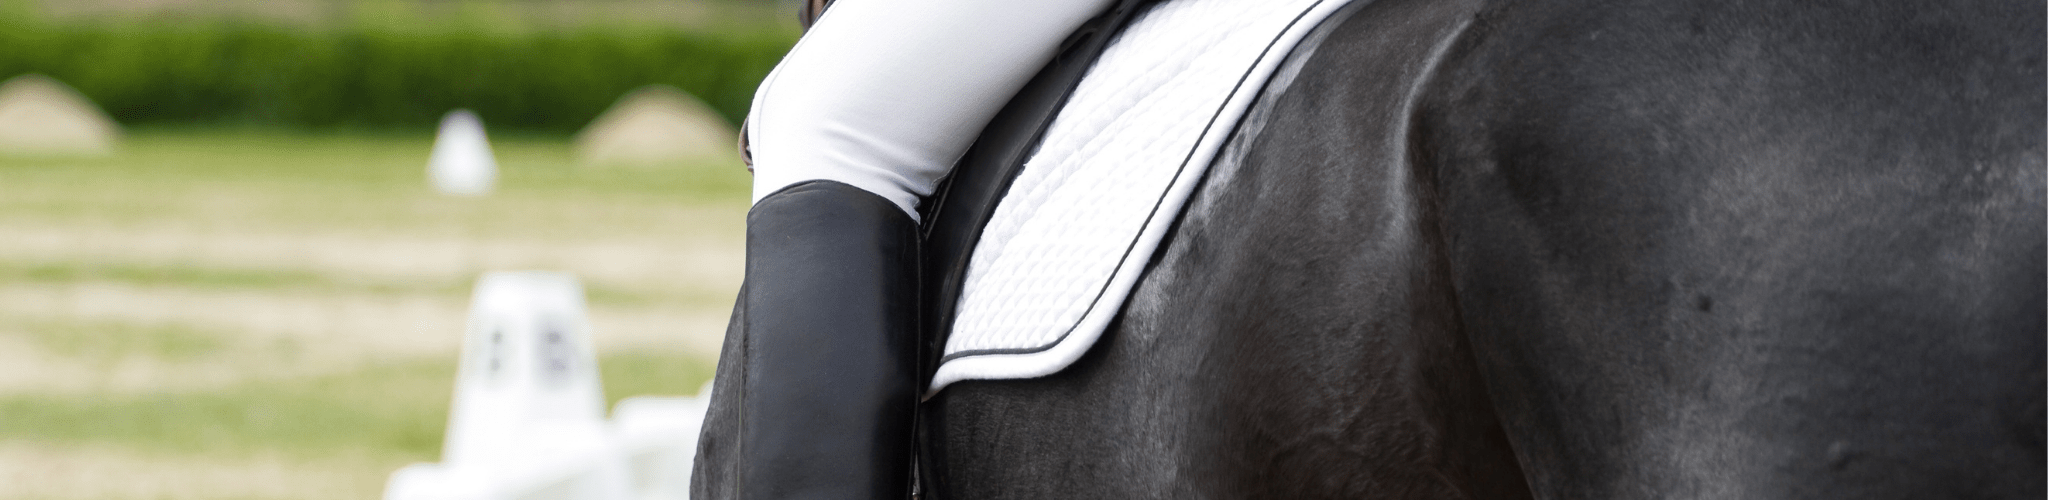 best dressage saddle pads